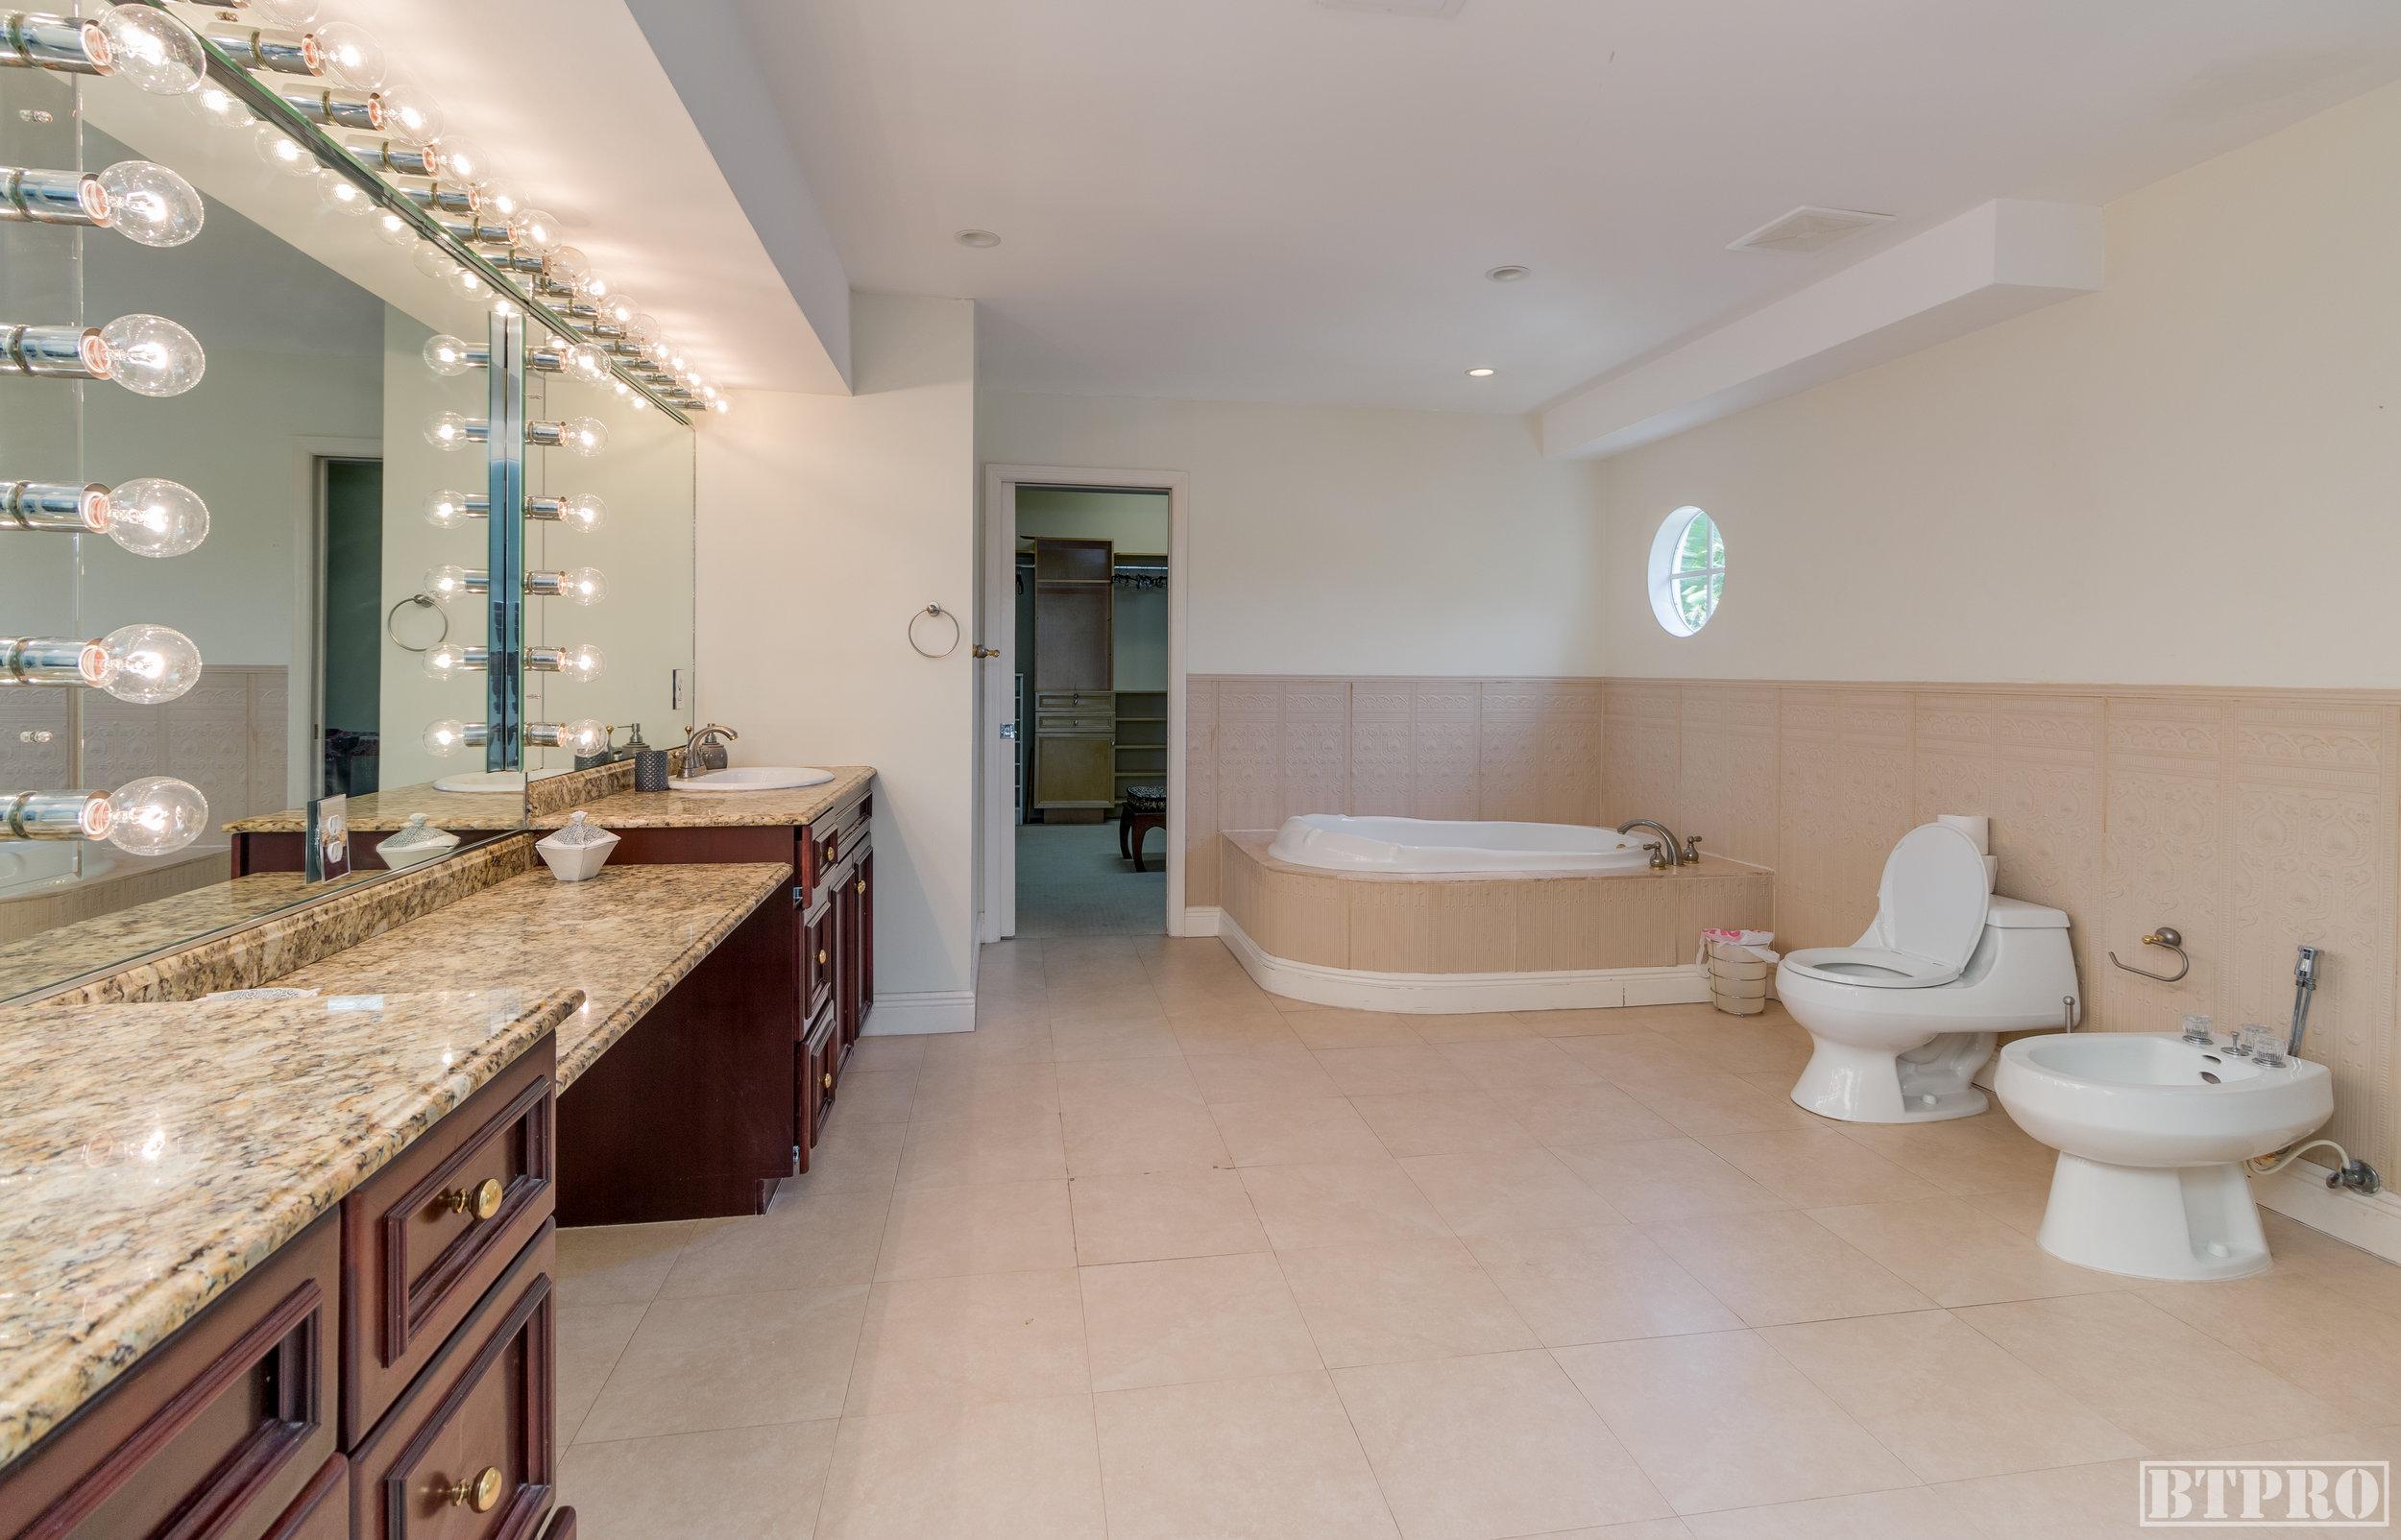 real estate, miami real estate, villa, real estate photo, real estate photography, jasmine, mansion, south beach, miami beach